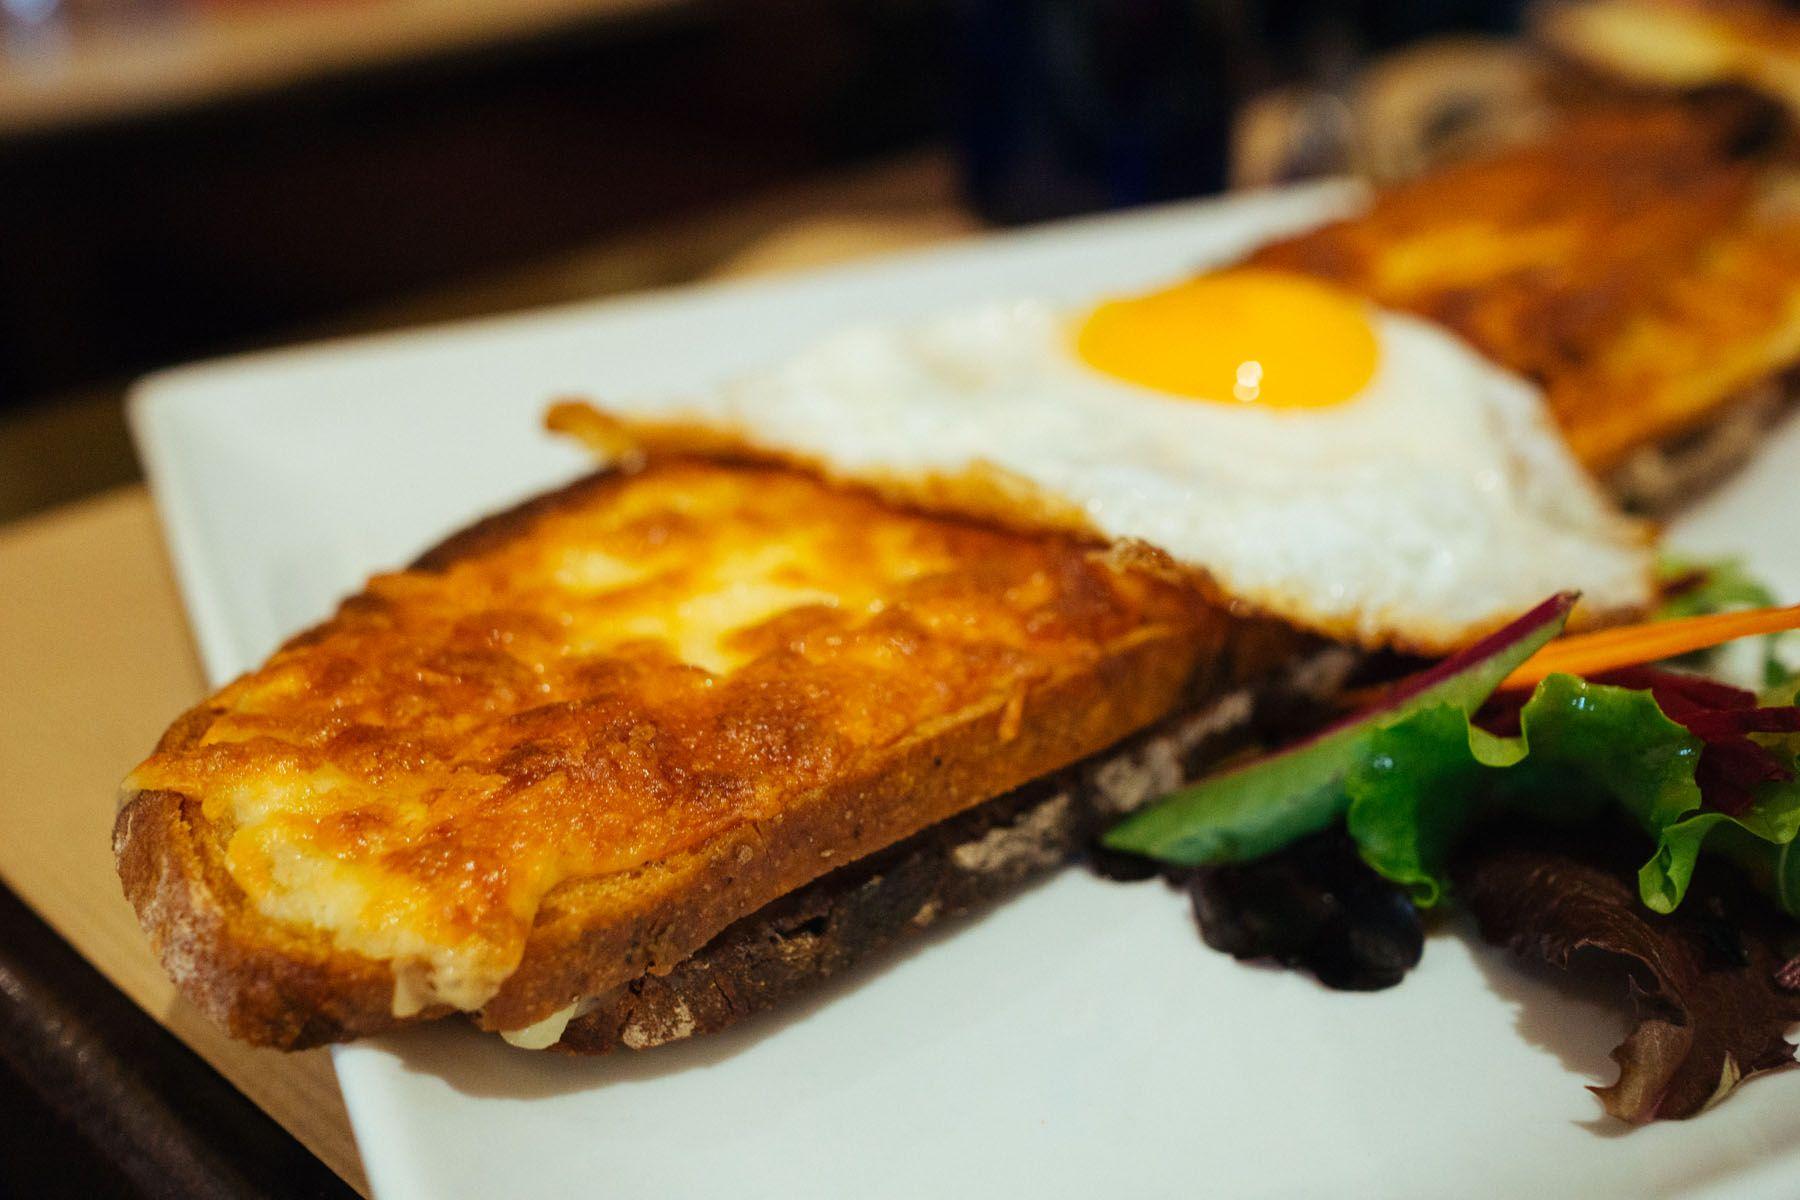 Paris Cray Croque Madame At Les Progres Croque Madame Grilled Ham And Cheese Croque Monsieur